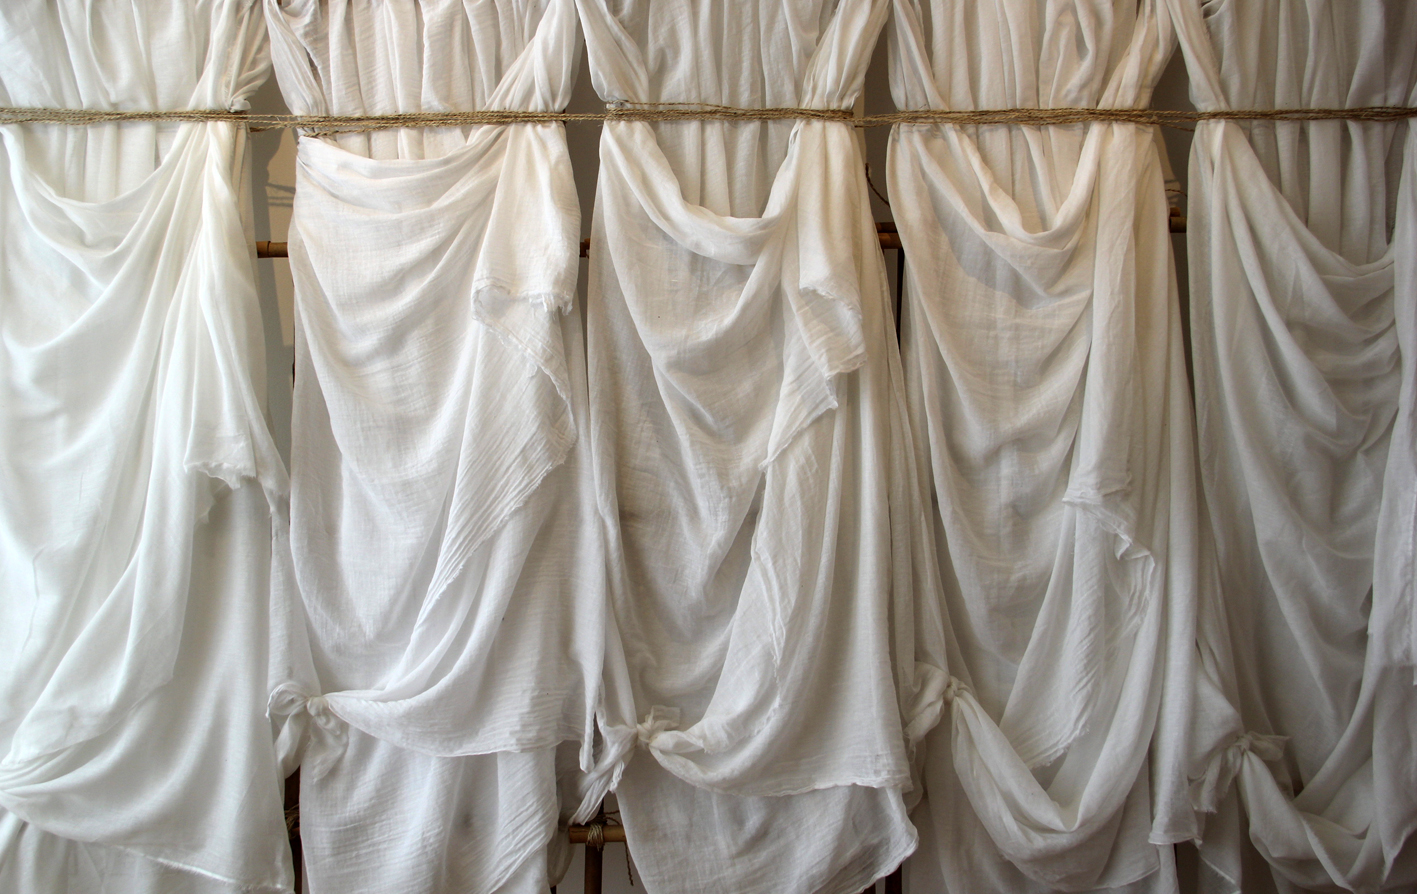 Elizabeth Wallace, 'Together Alone' (Detail), 2016 <br/> muslin, bamboo, twine, 180 cm x 230 cm